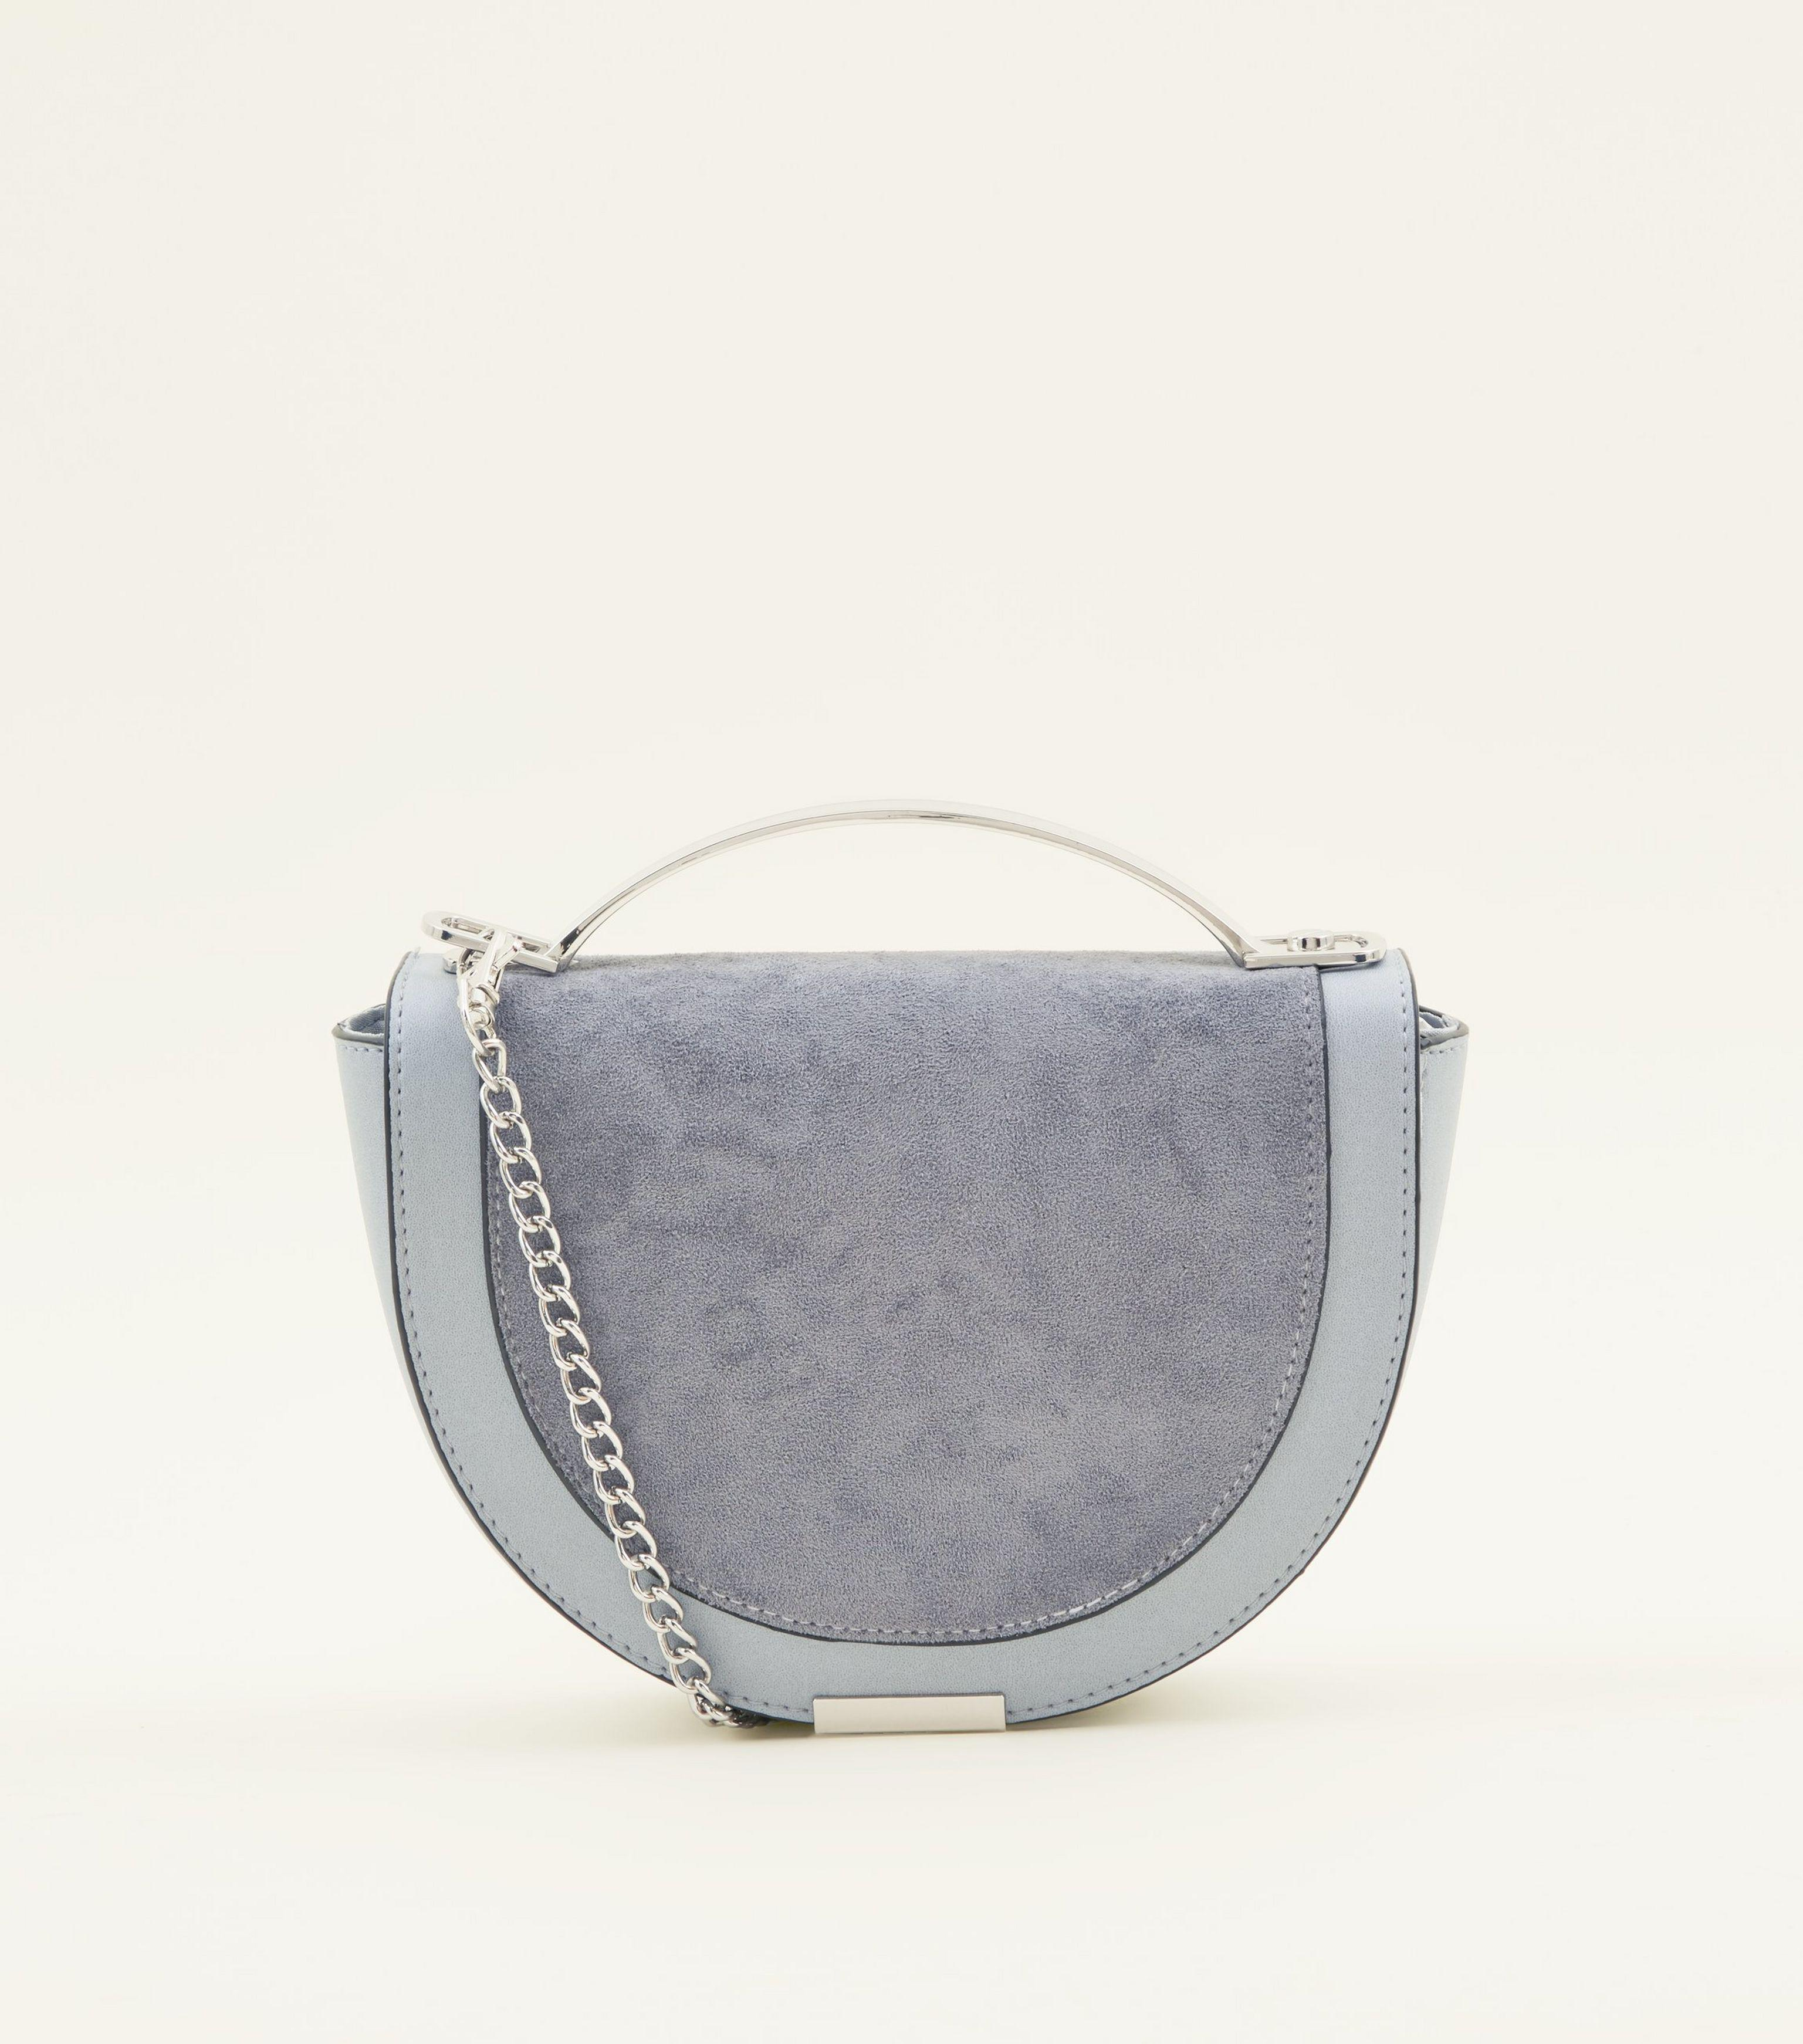 New Look Pale Blue Curved Metal Handle Cross Body Bag in Blue - Lyst c1dbab885eec7